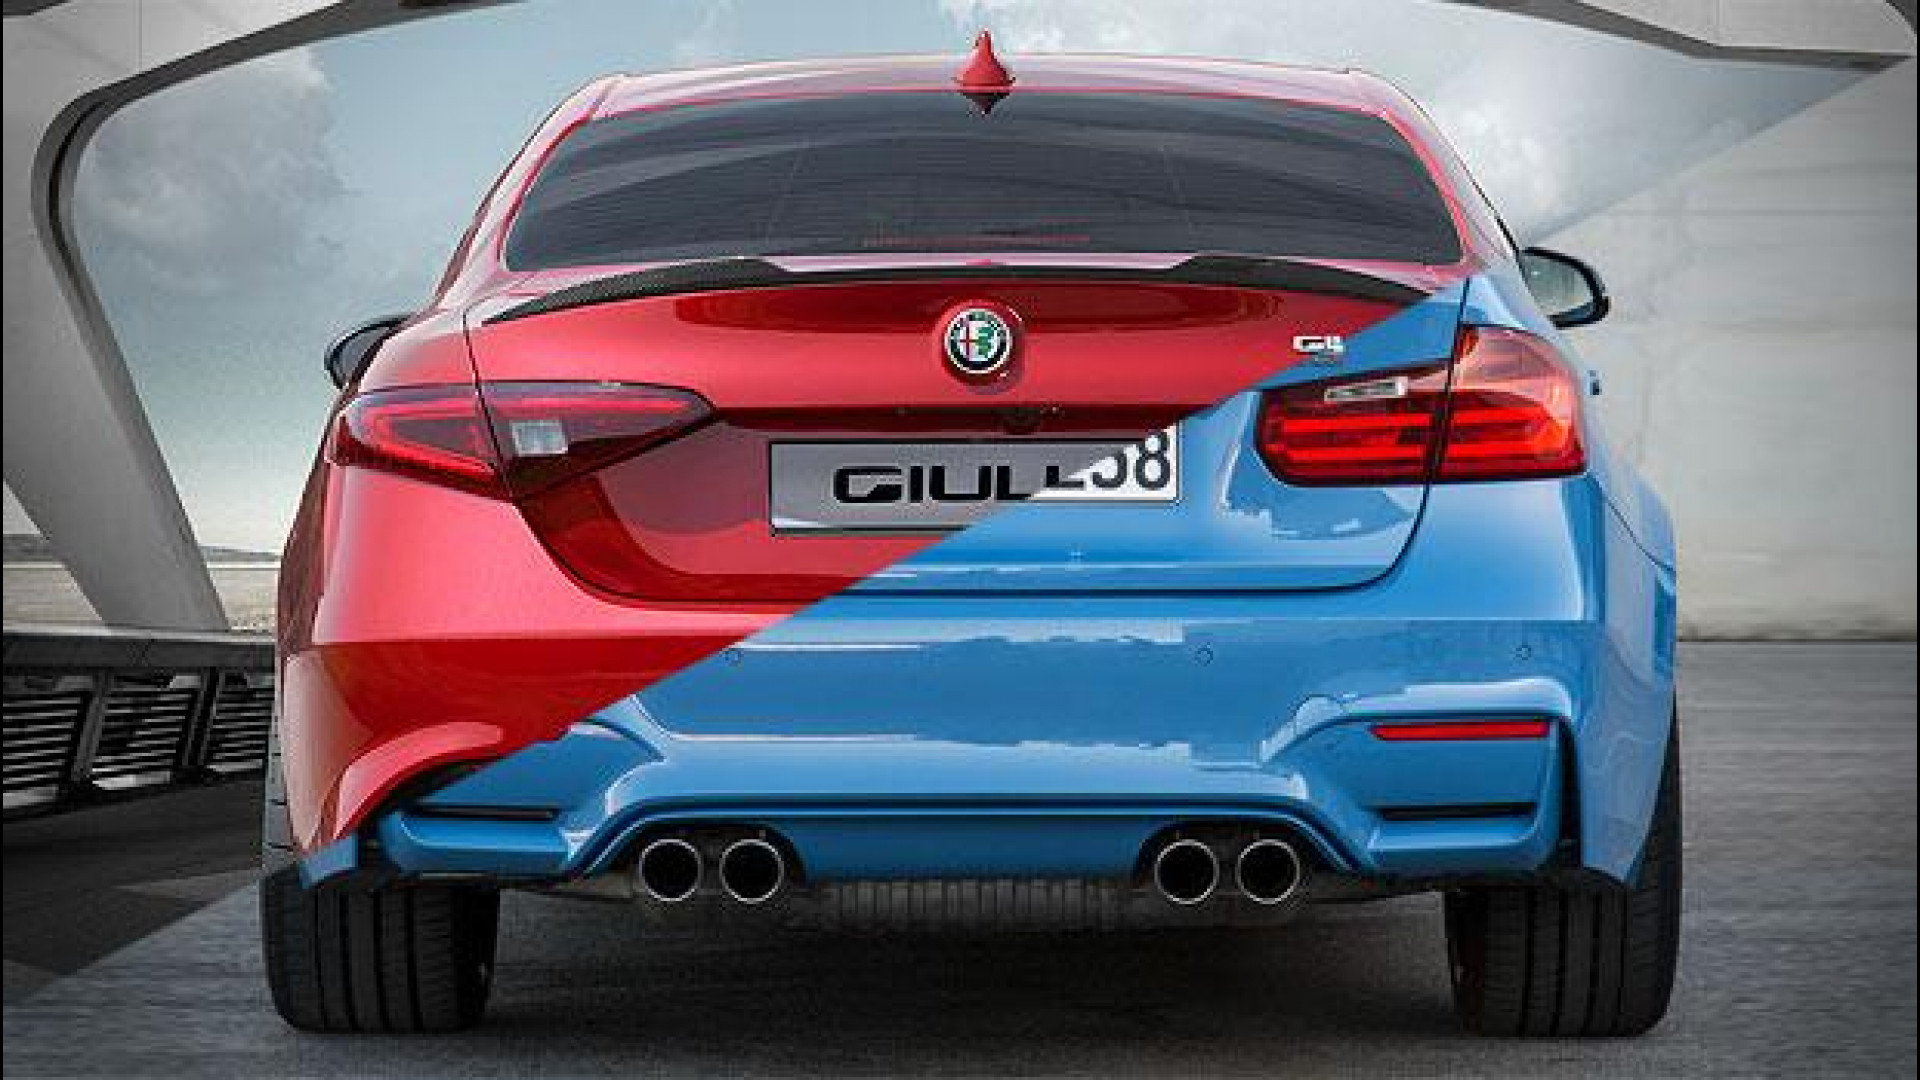 Giulia Serie